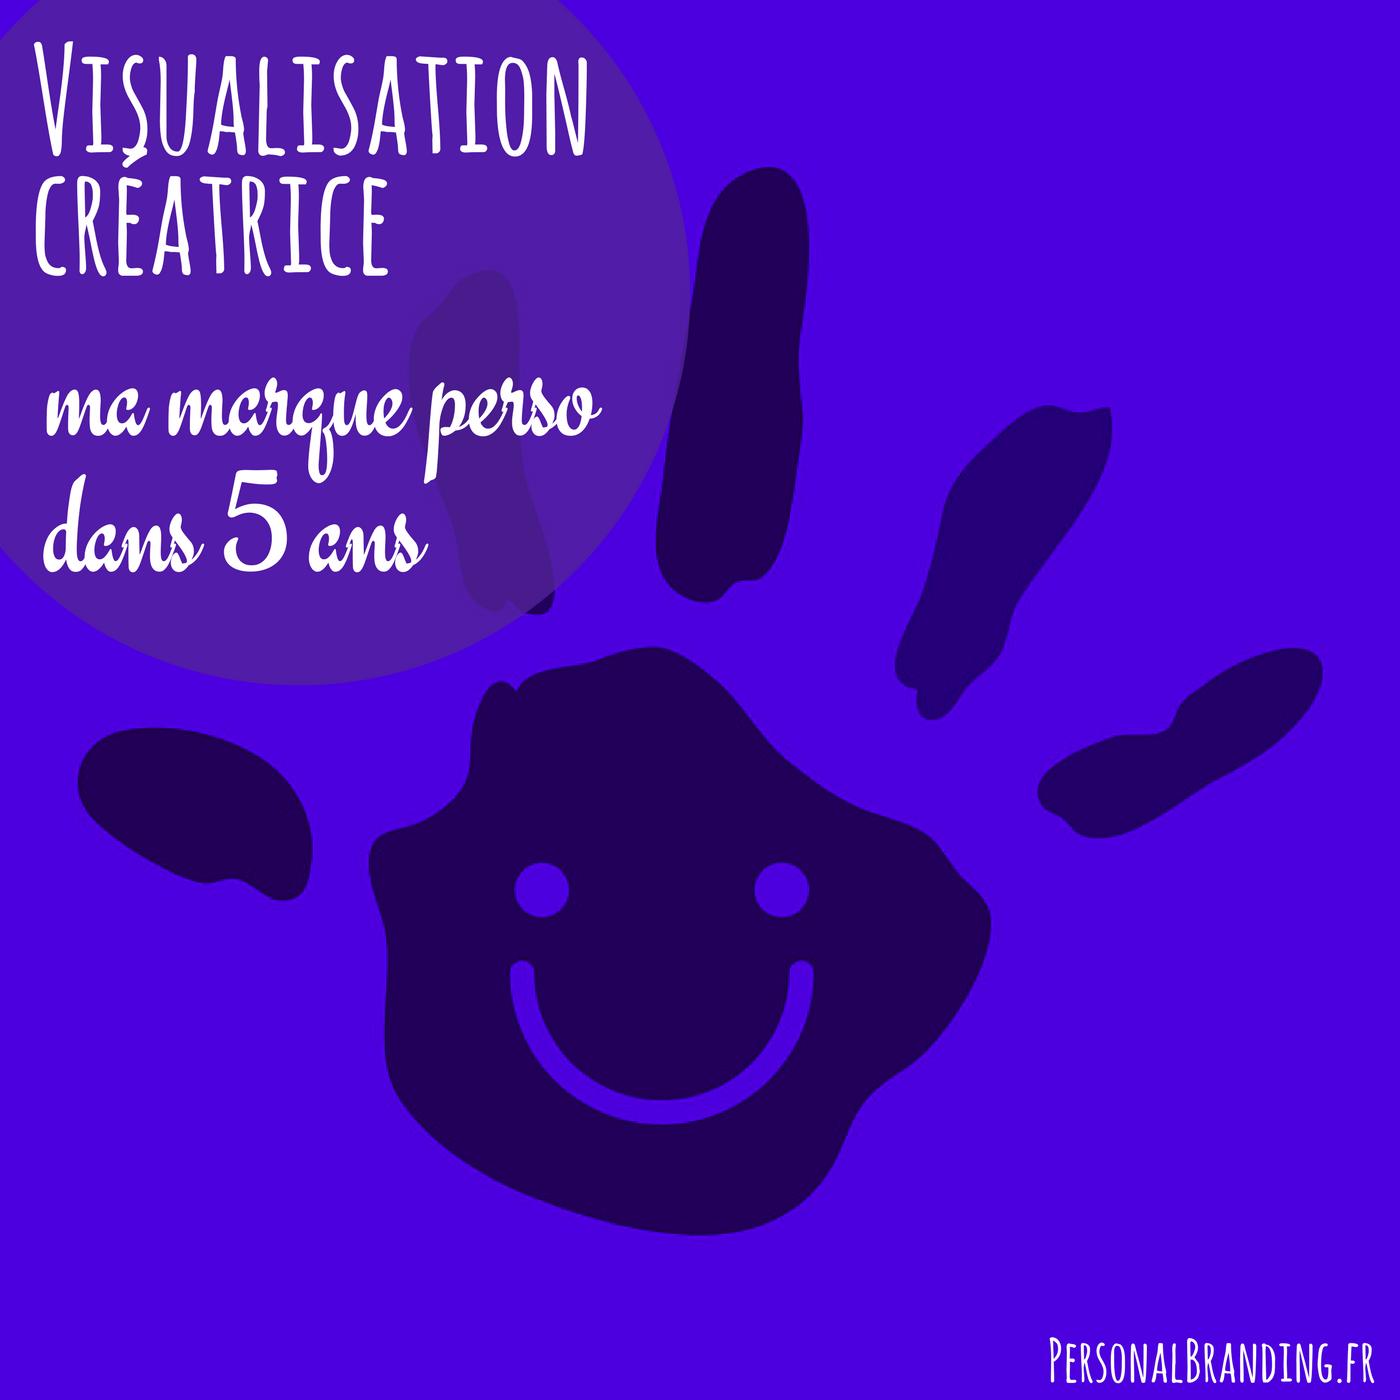 Visualisation créatrice Ma marque perso dans 5 ans